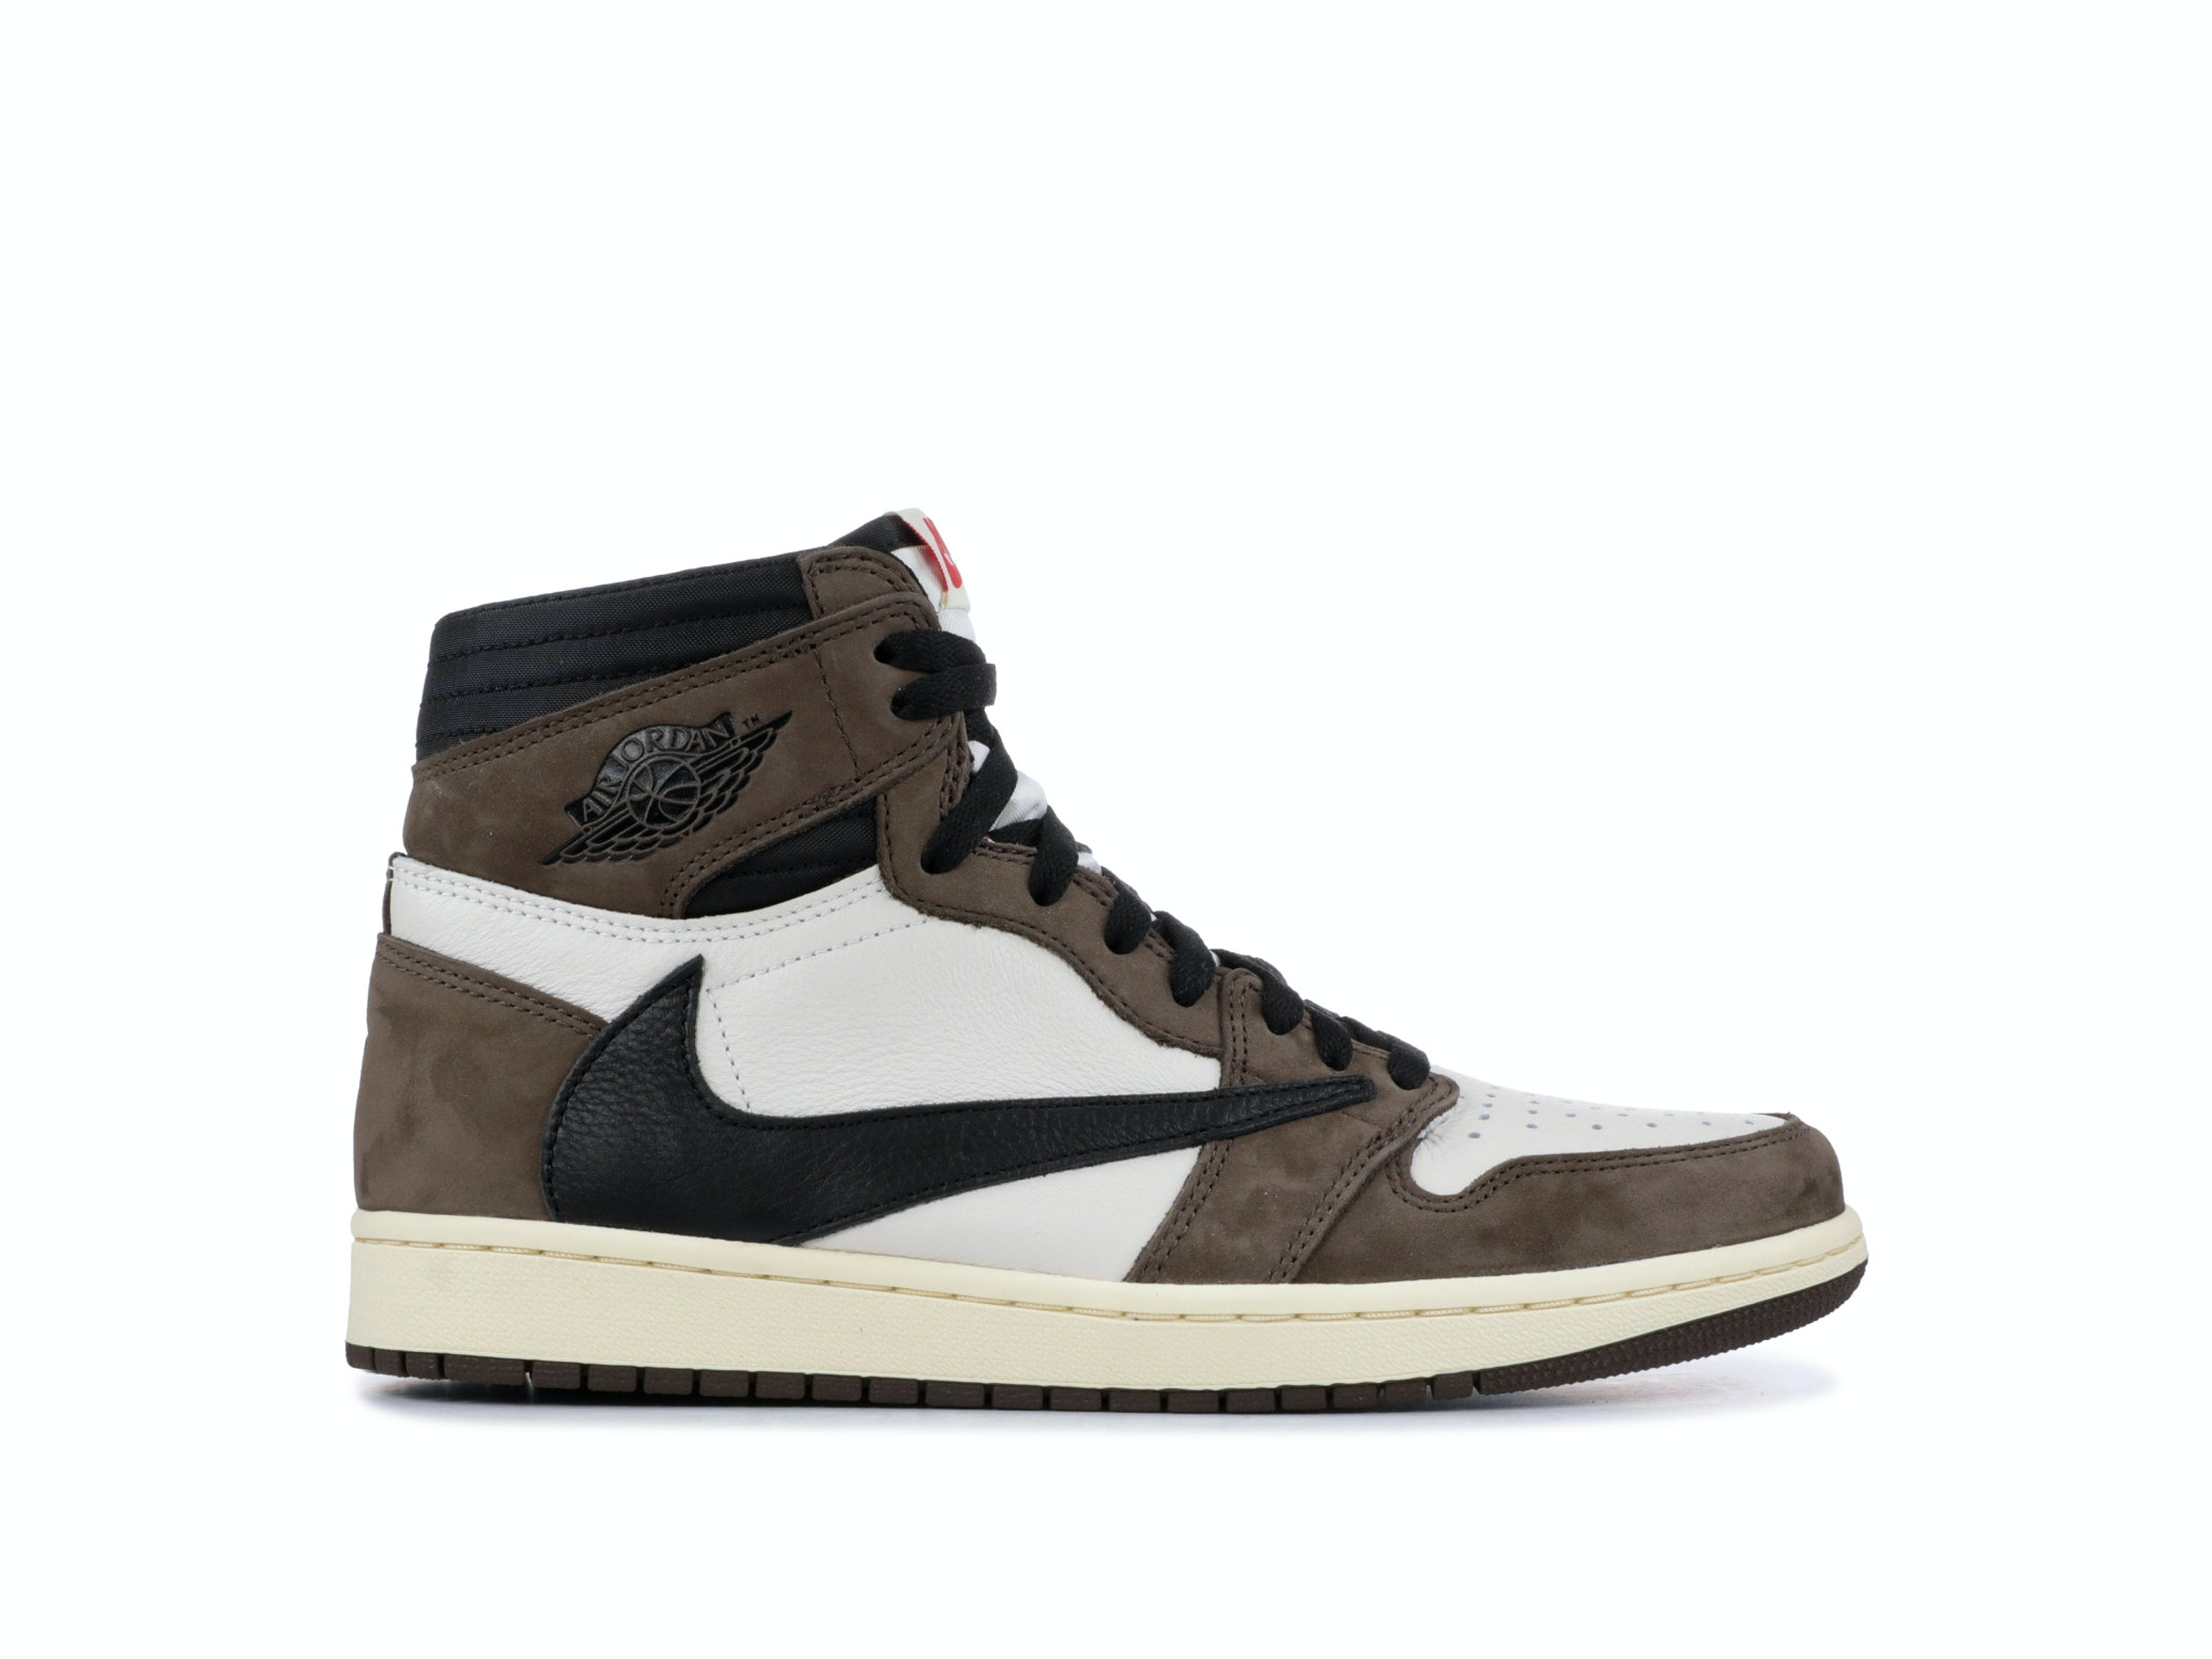 ba797d7b05b Shop Travis Scott x Air Jordan 1 Retro High OG 'Mocha' Online | Laced